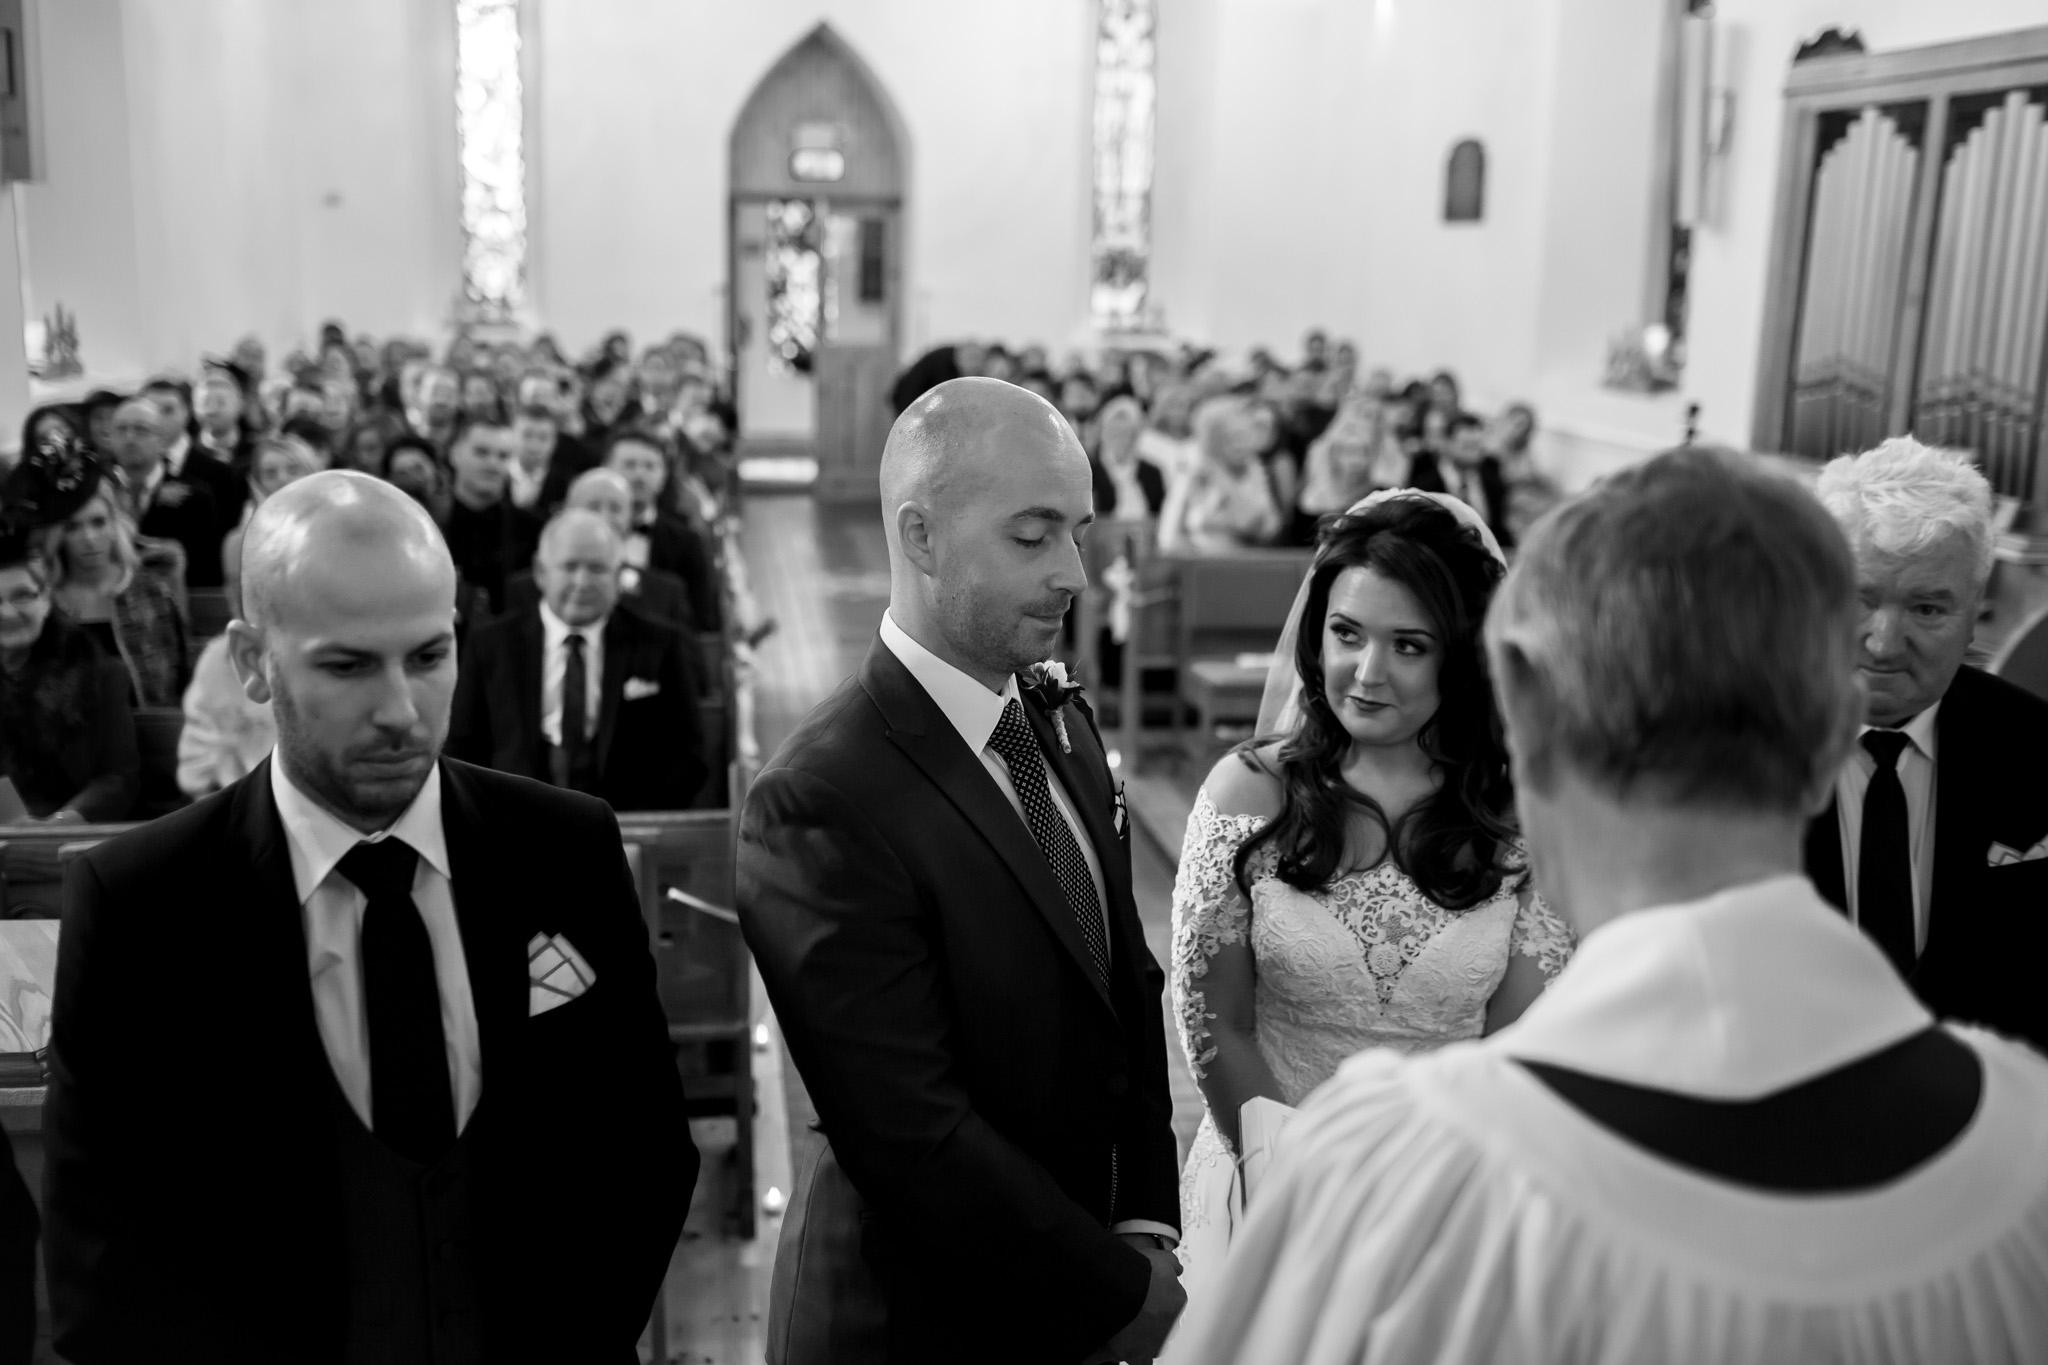 Mark_Barnes_Northern_Ireland_wedding_photographer_Harveys_Point_Donegall_Wedding_photography-Adam&Gemma-19.jpg